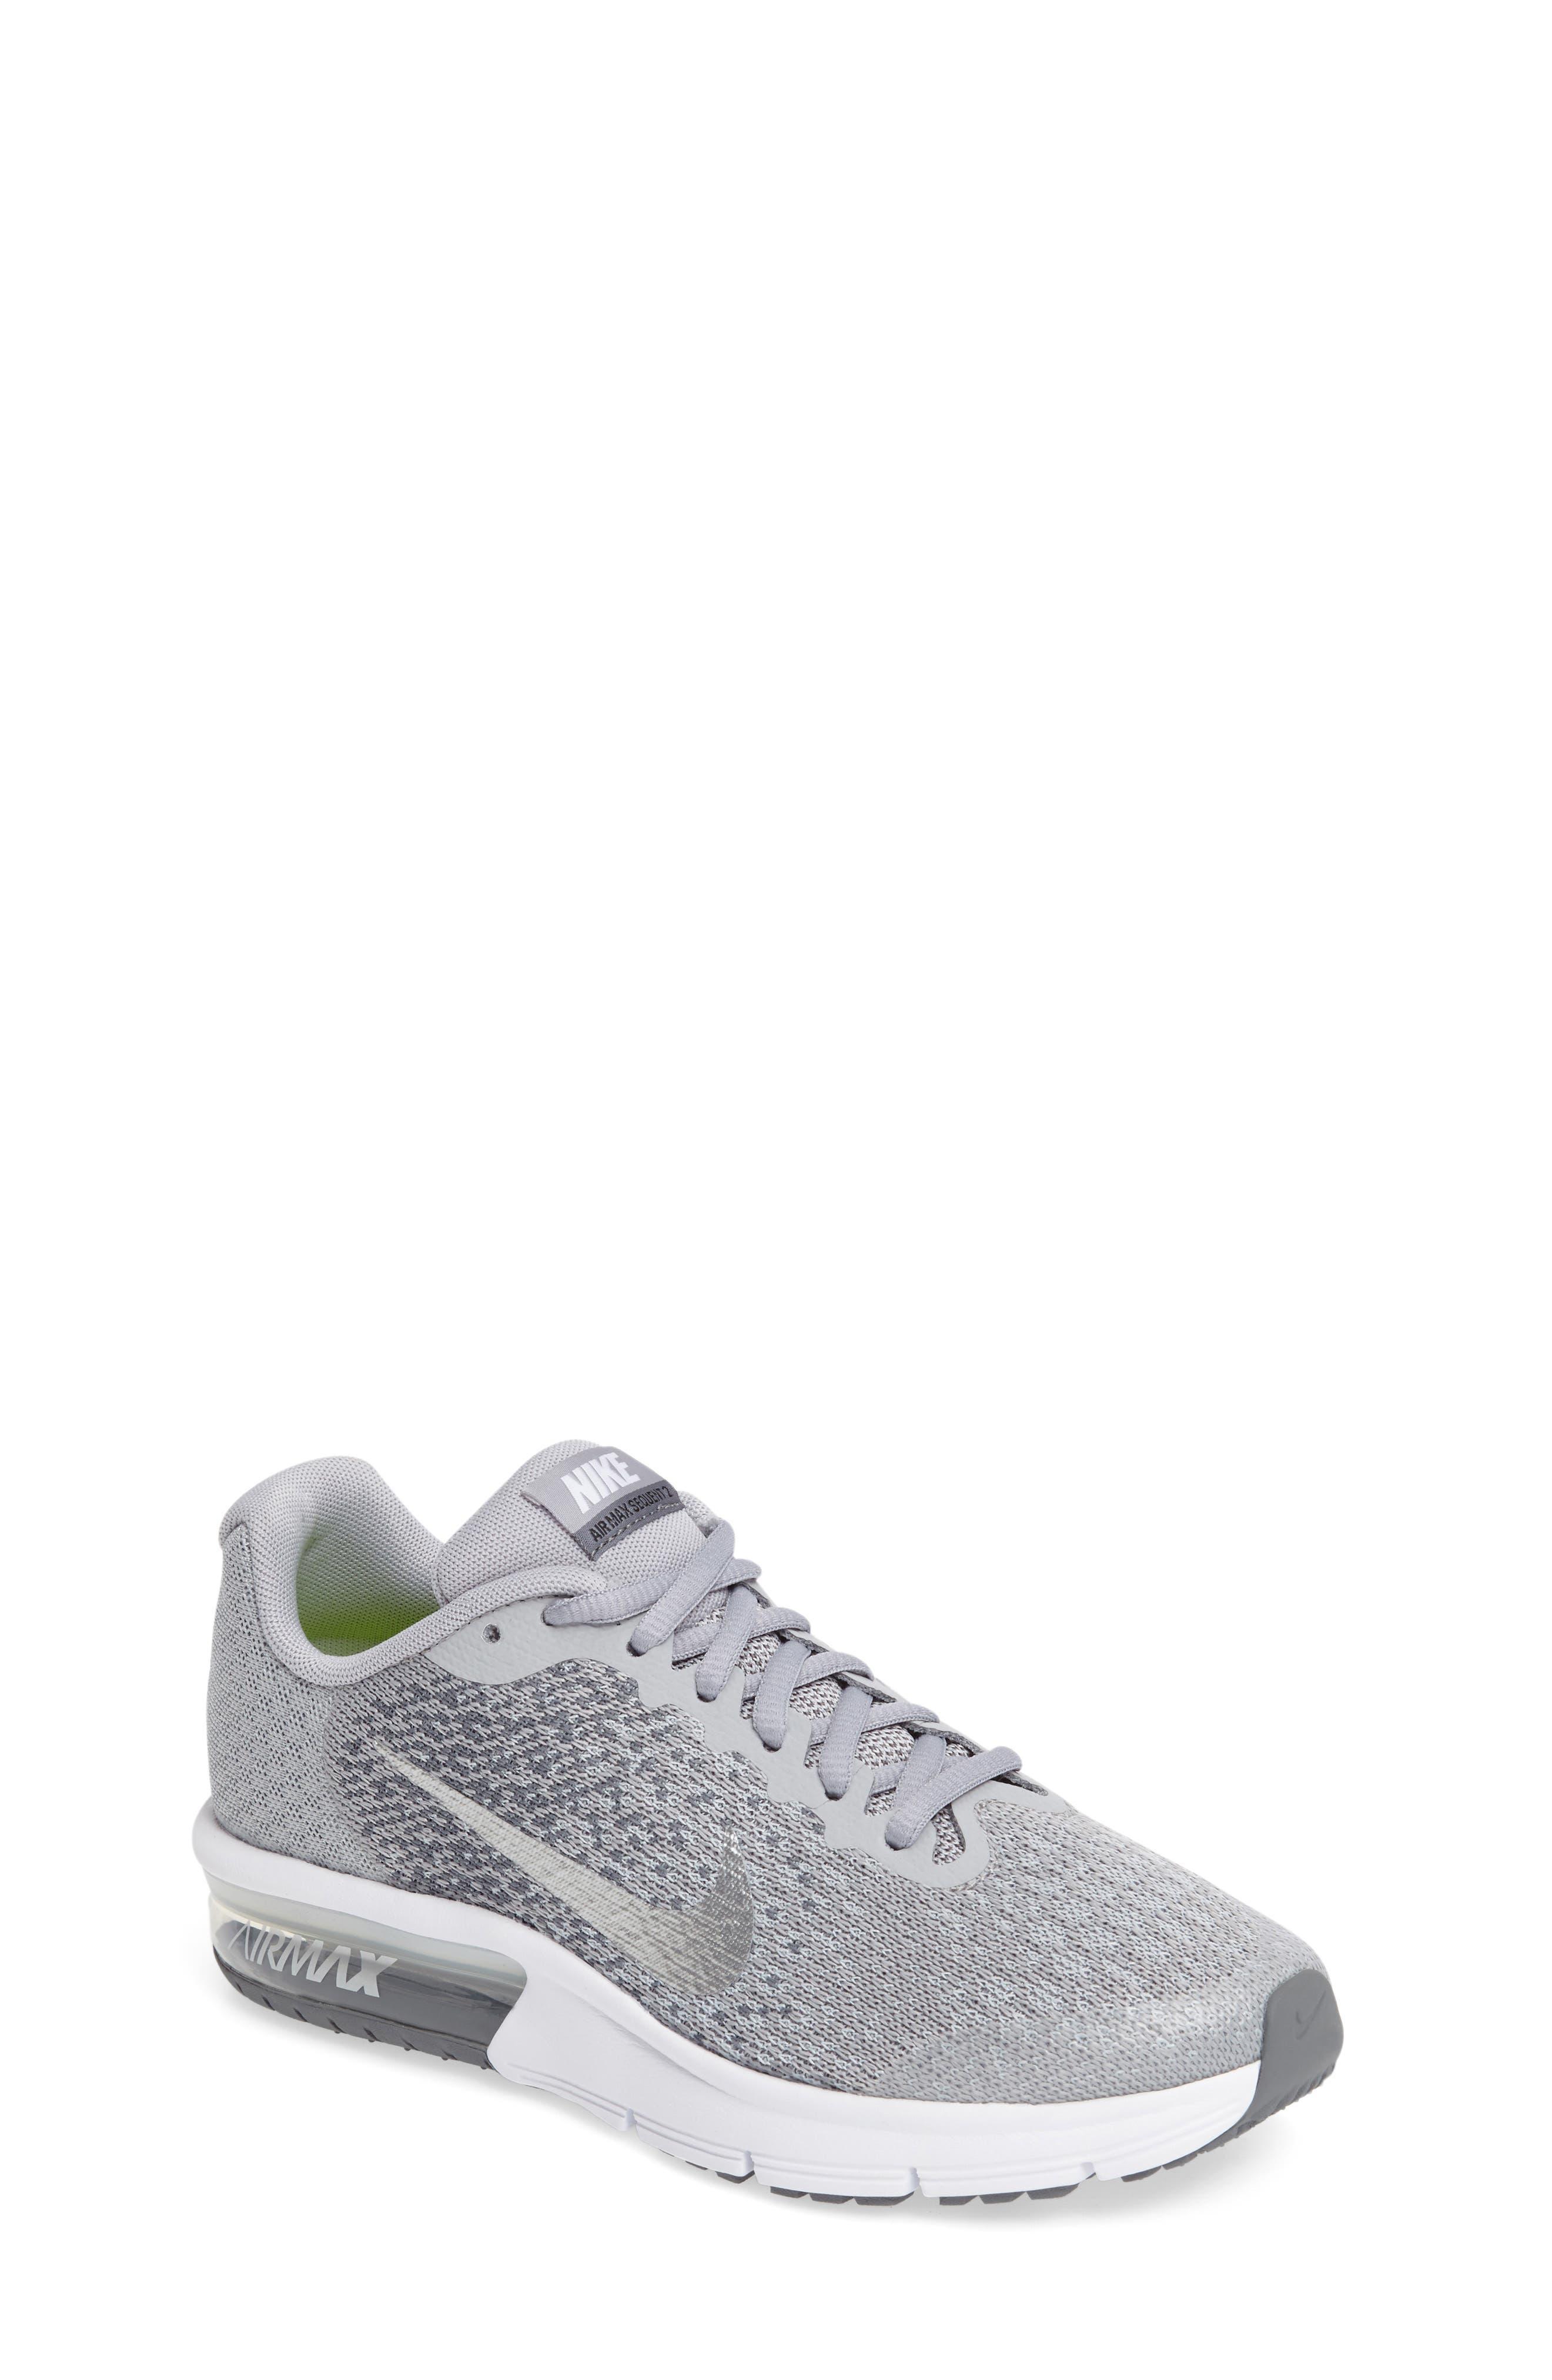 Air Max Sequent 2 Sneaker,                             Main thumbnail 1, color,                             020